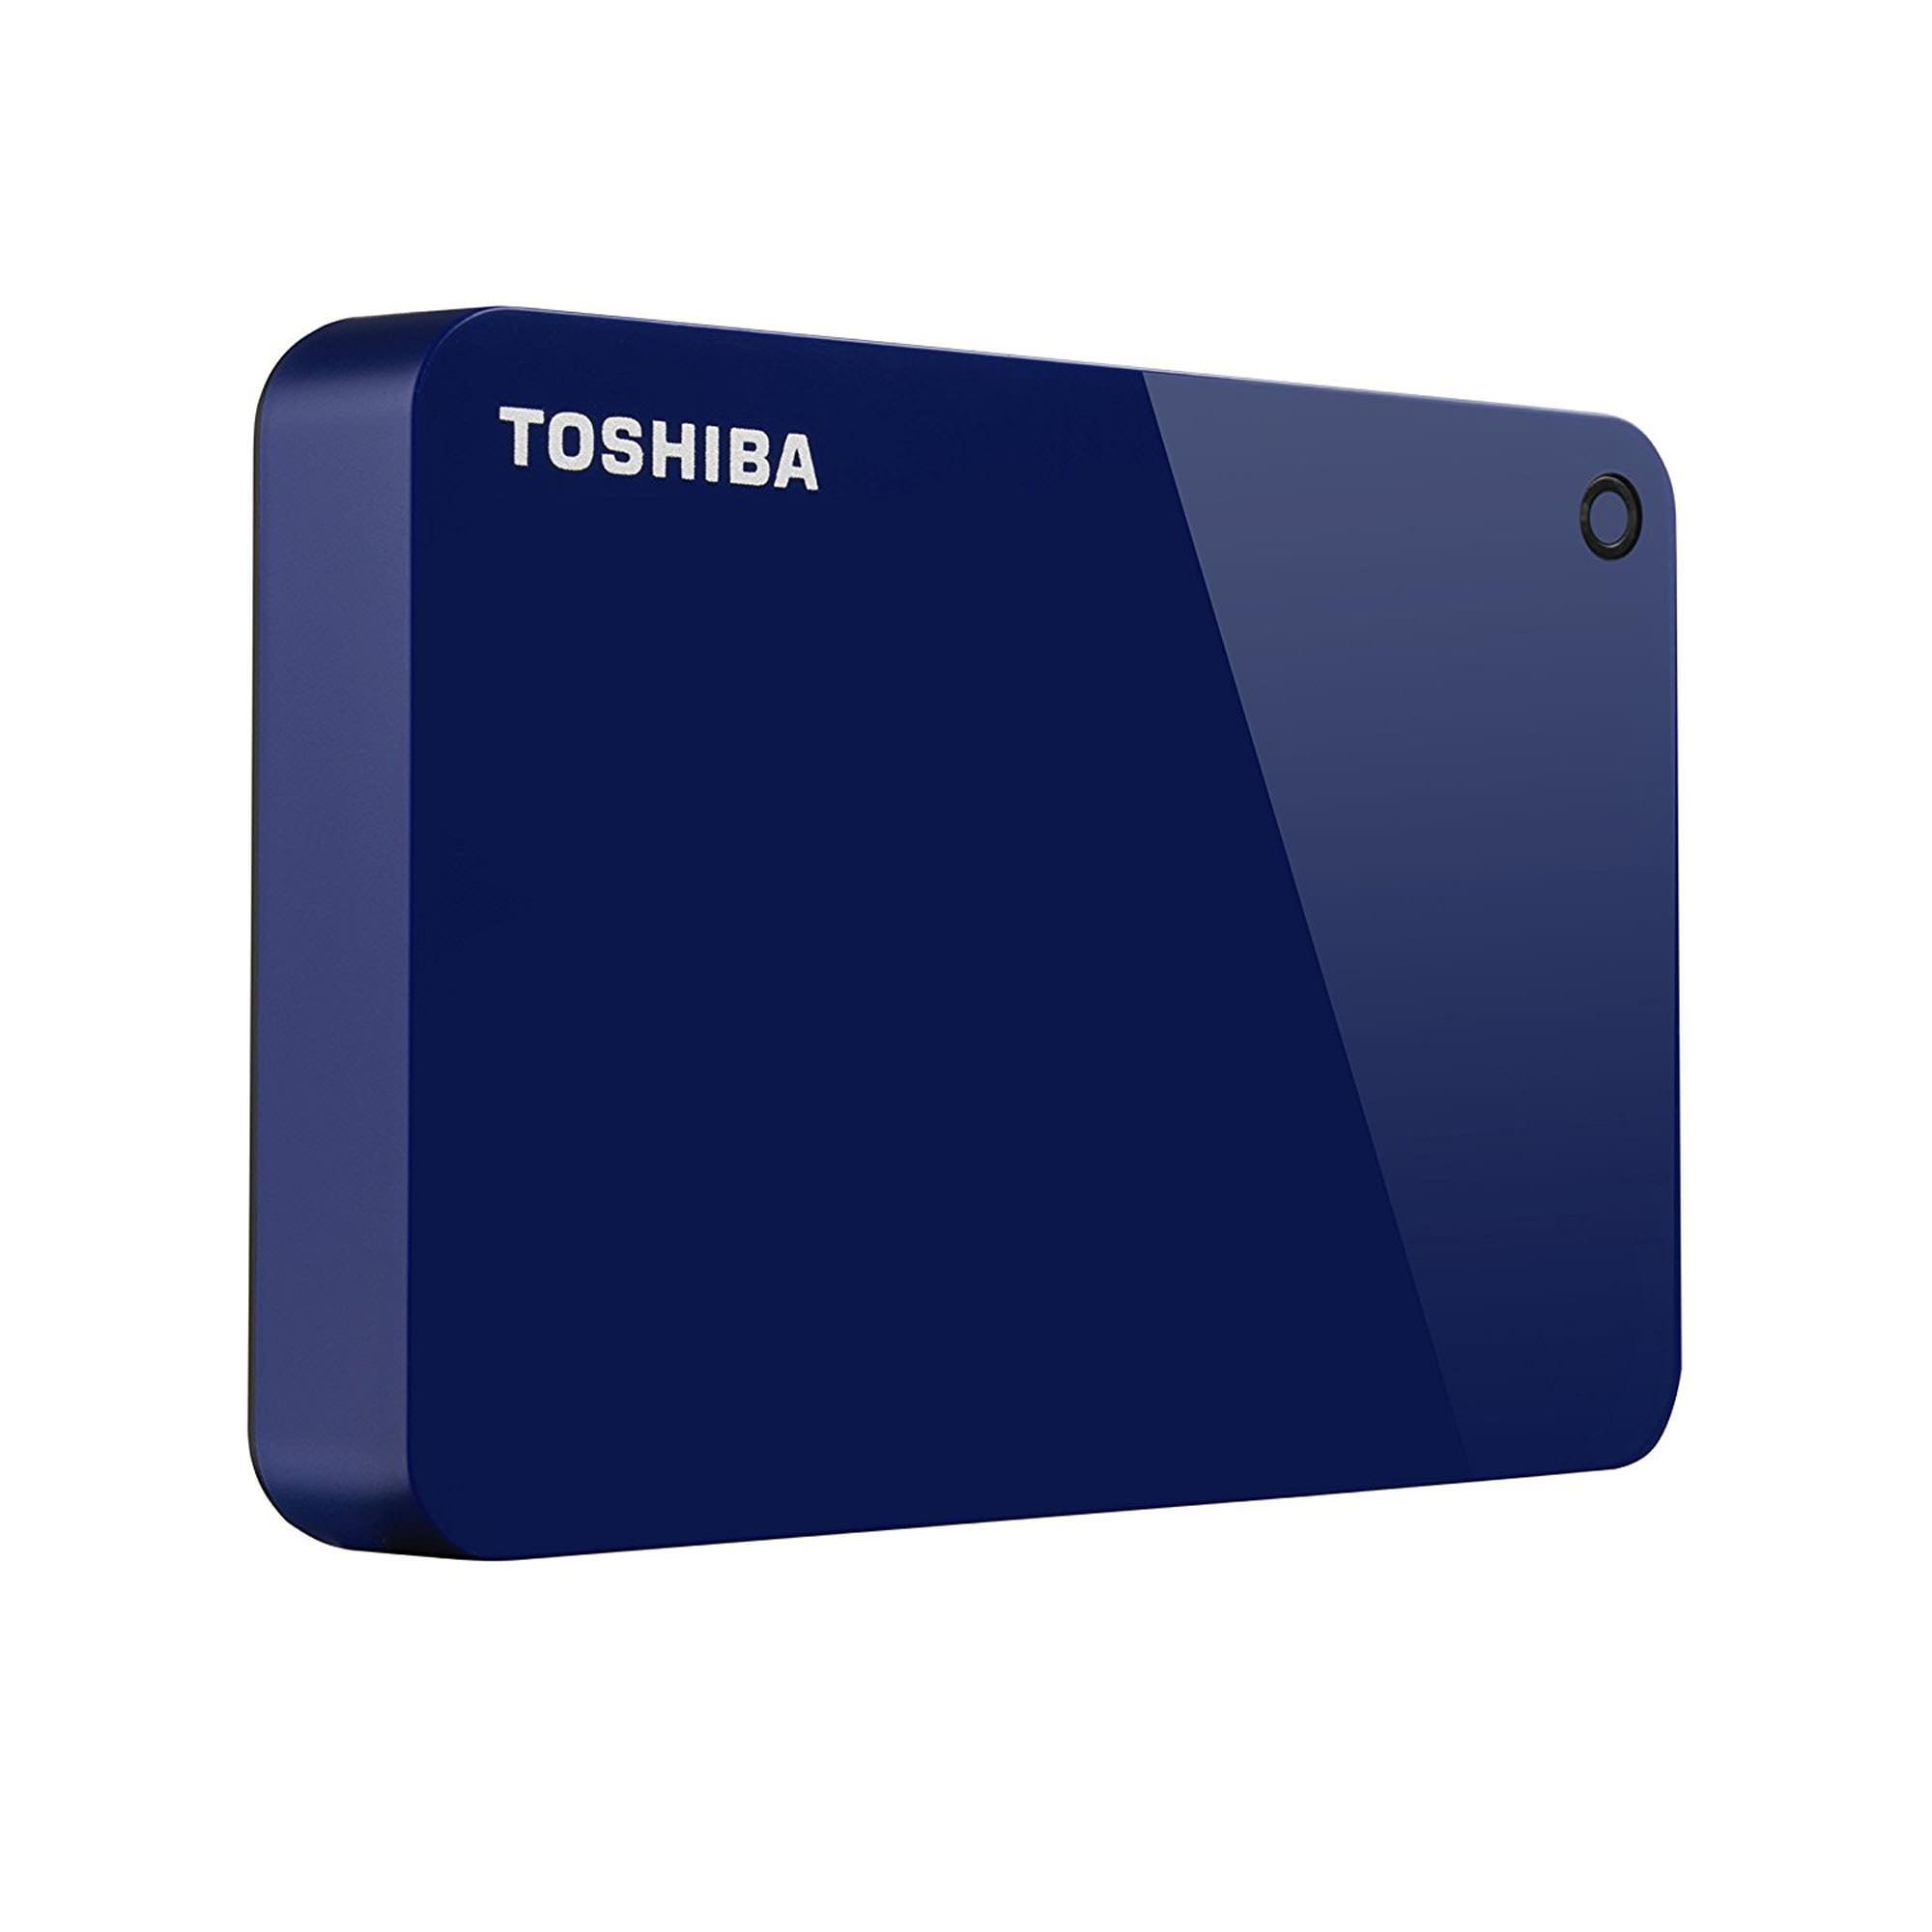 Toshiba Canvio Advance 3 Tb Portable External Hard Drive Usb 3.0 Blue   Hdtc930 Xl3 Ca by Toshiba